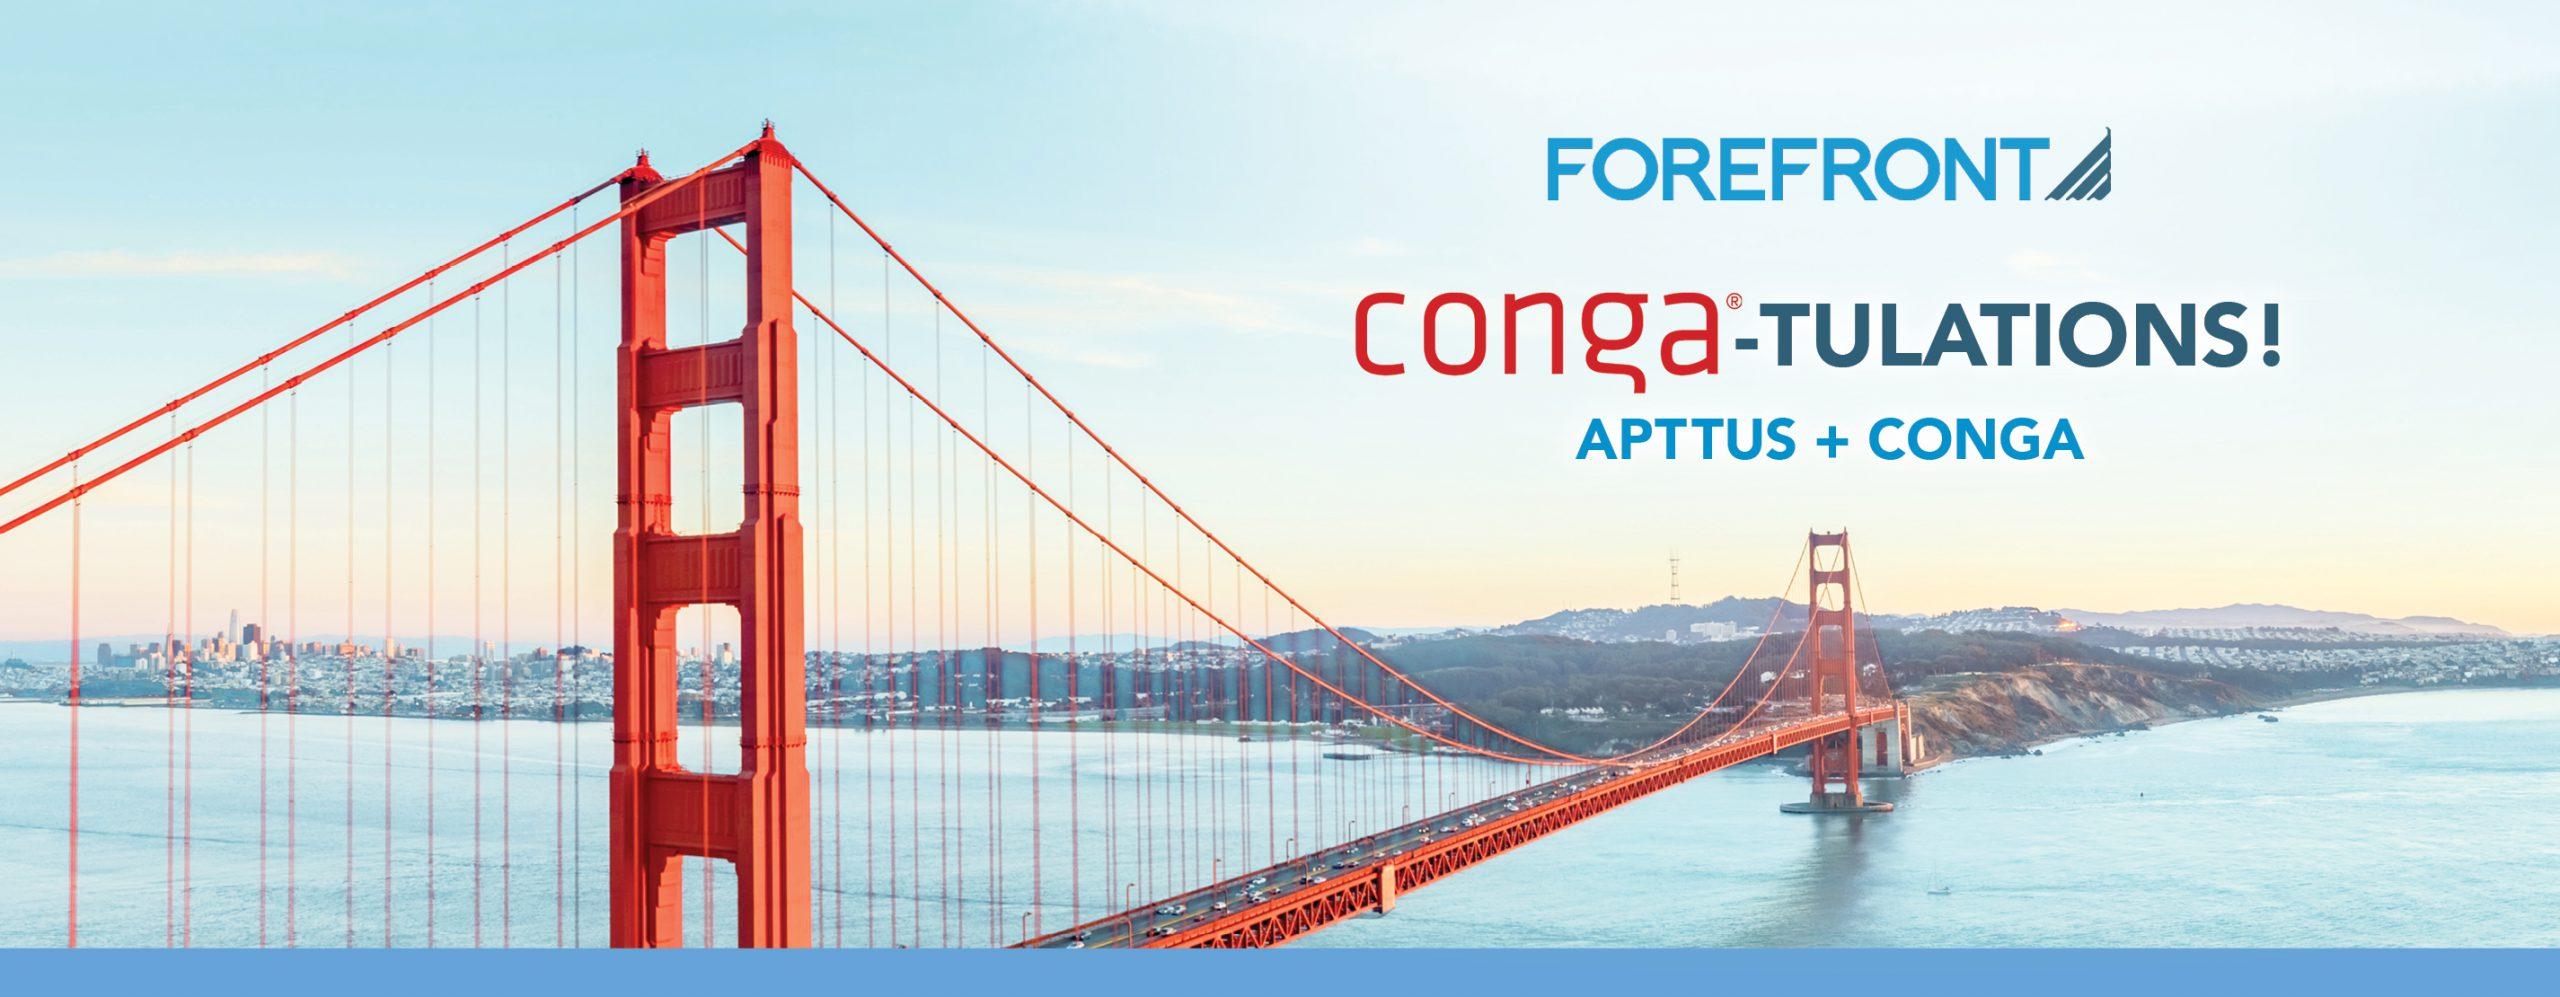 Conga-tulations Apttus + Conga